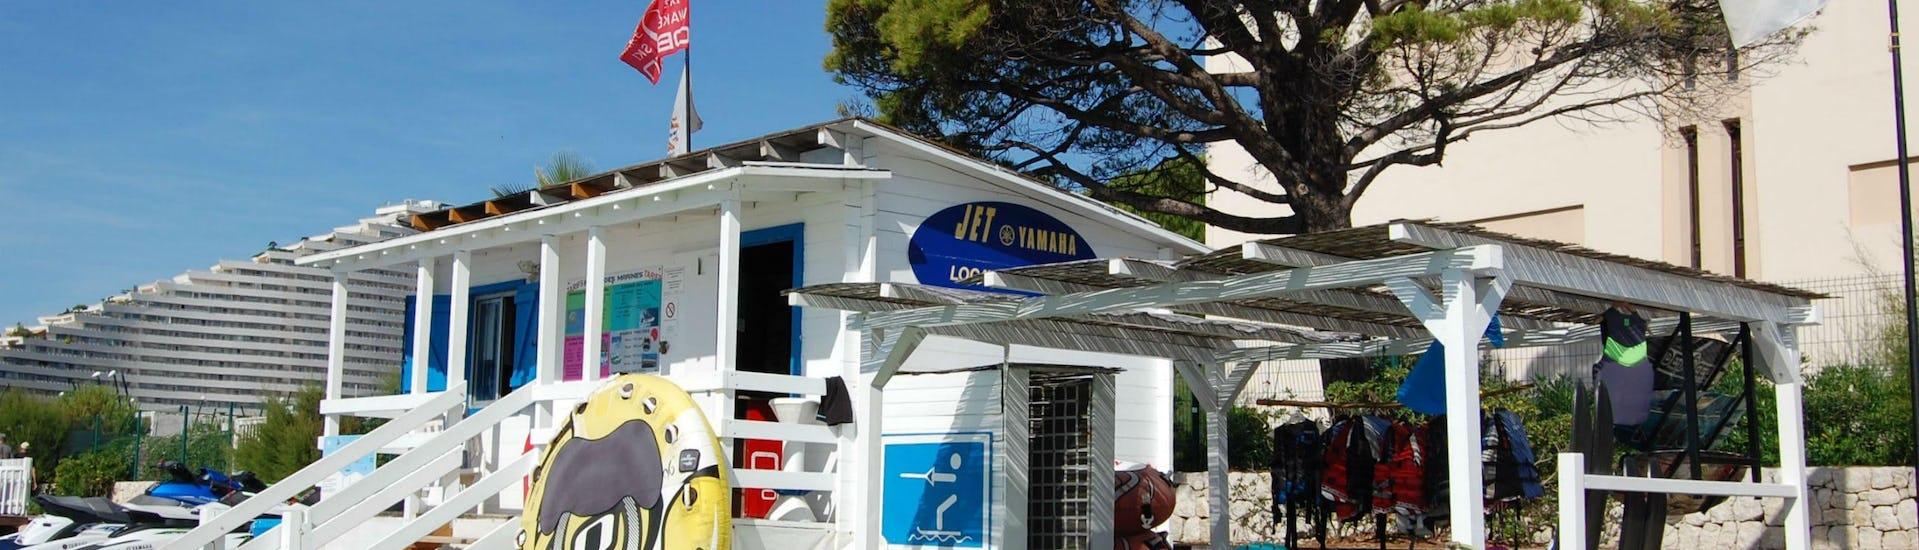 Wakeboarding & Wakesurfing in Cagnes-sur-Mer